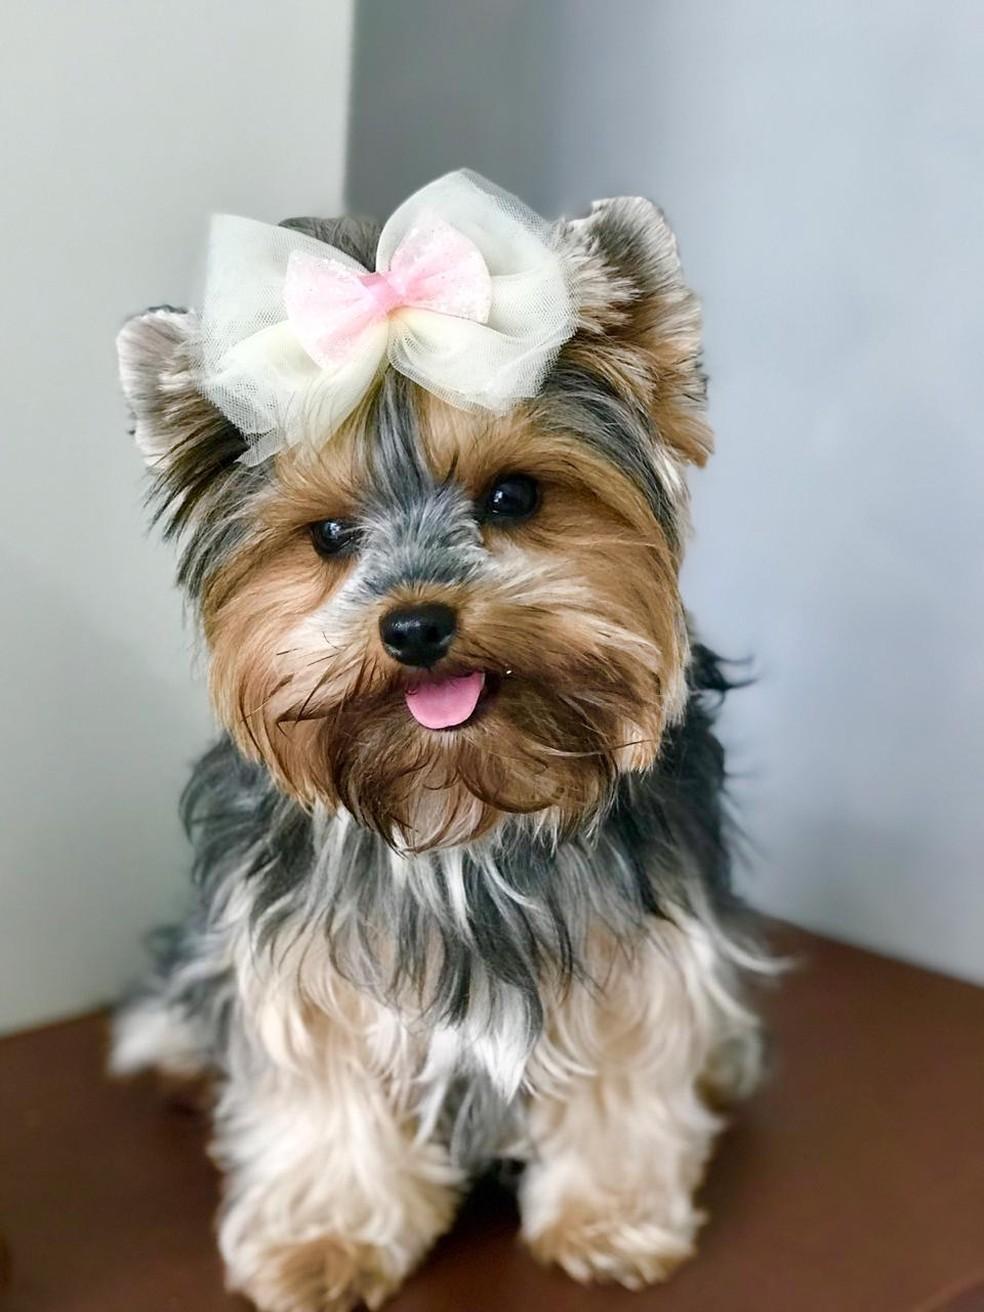 Maya, cachorra de Larissa, trabalha com ela na loja — Foto: Larissa Garcia/Arquivo pessoal